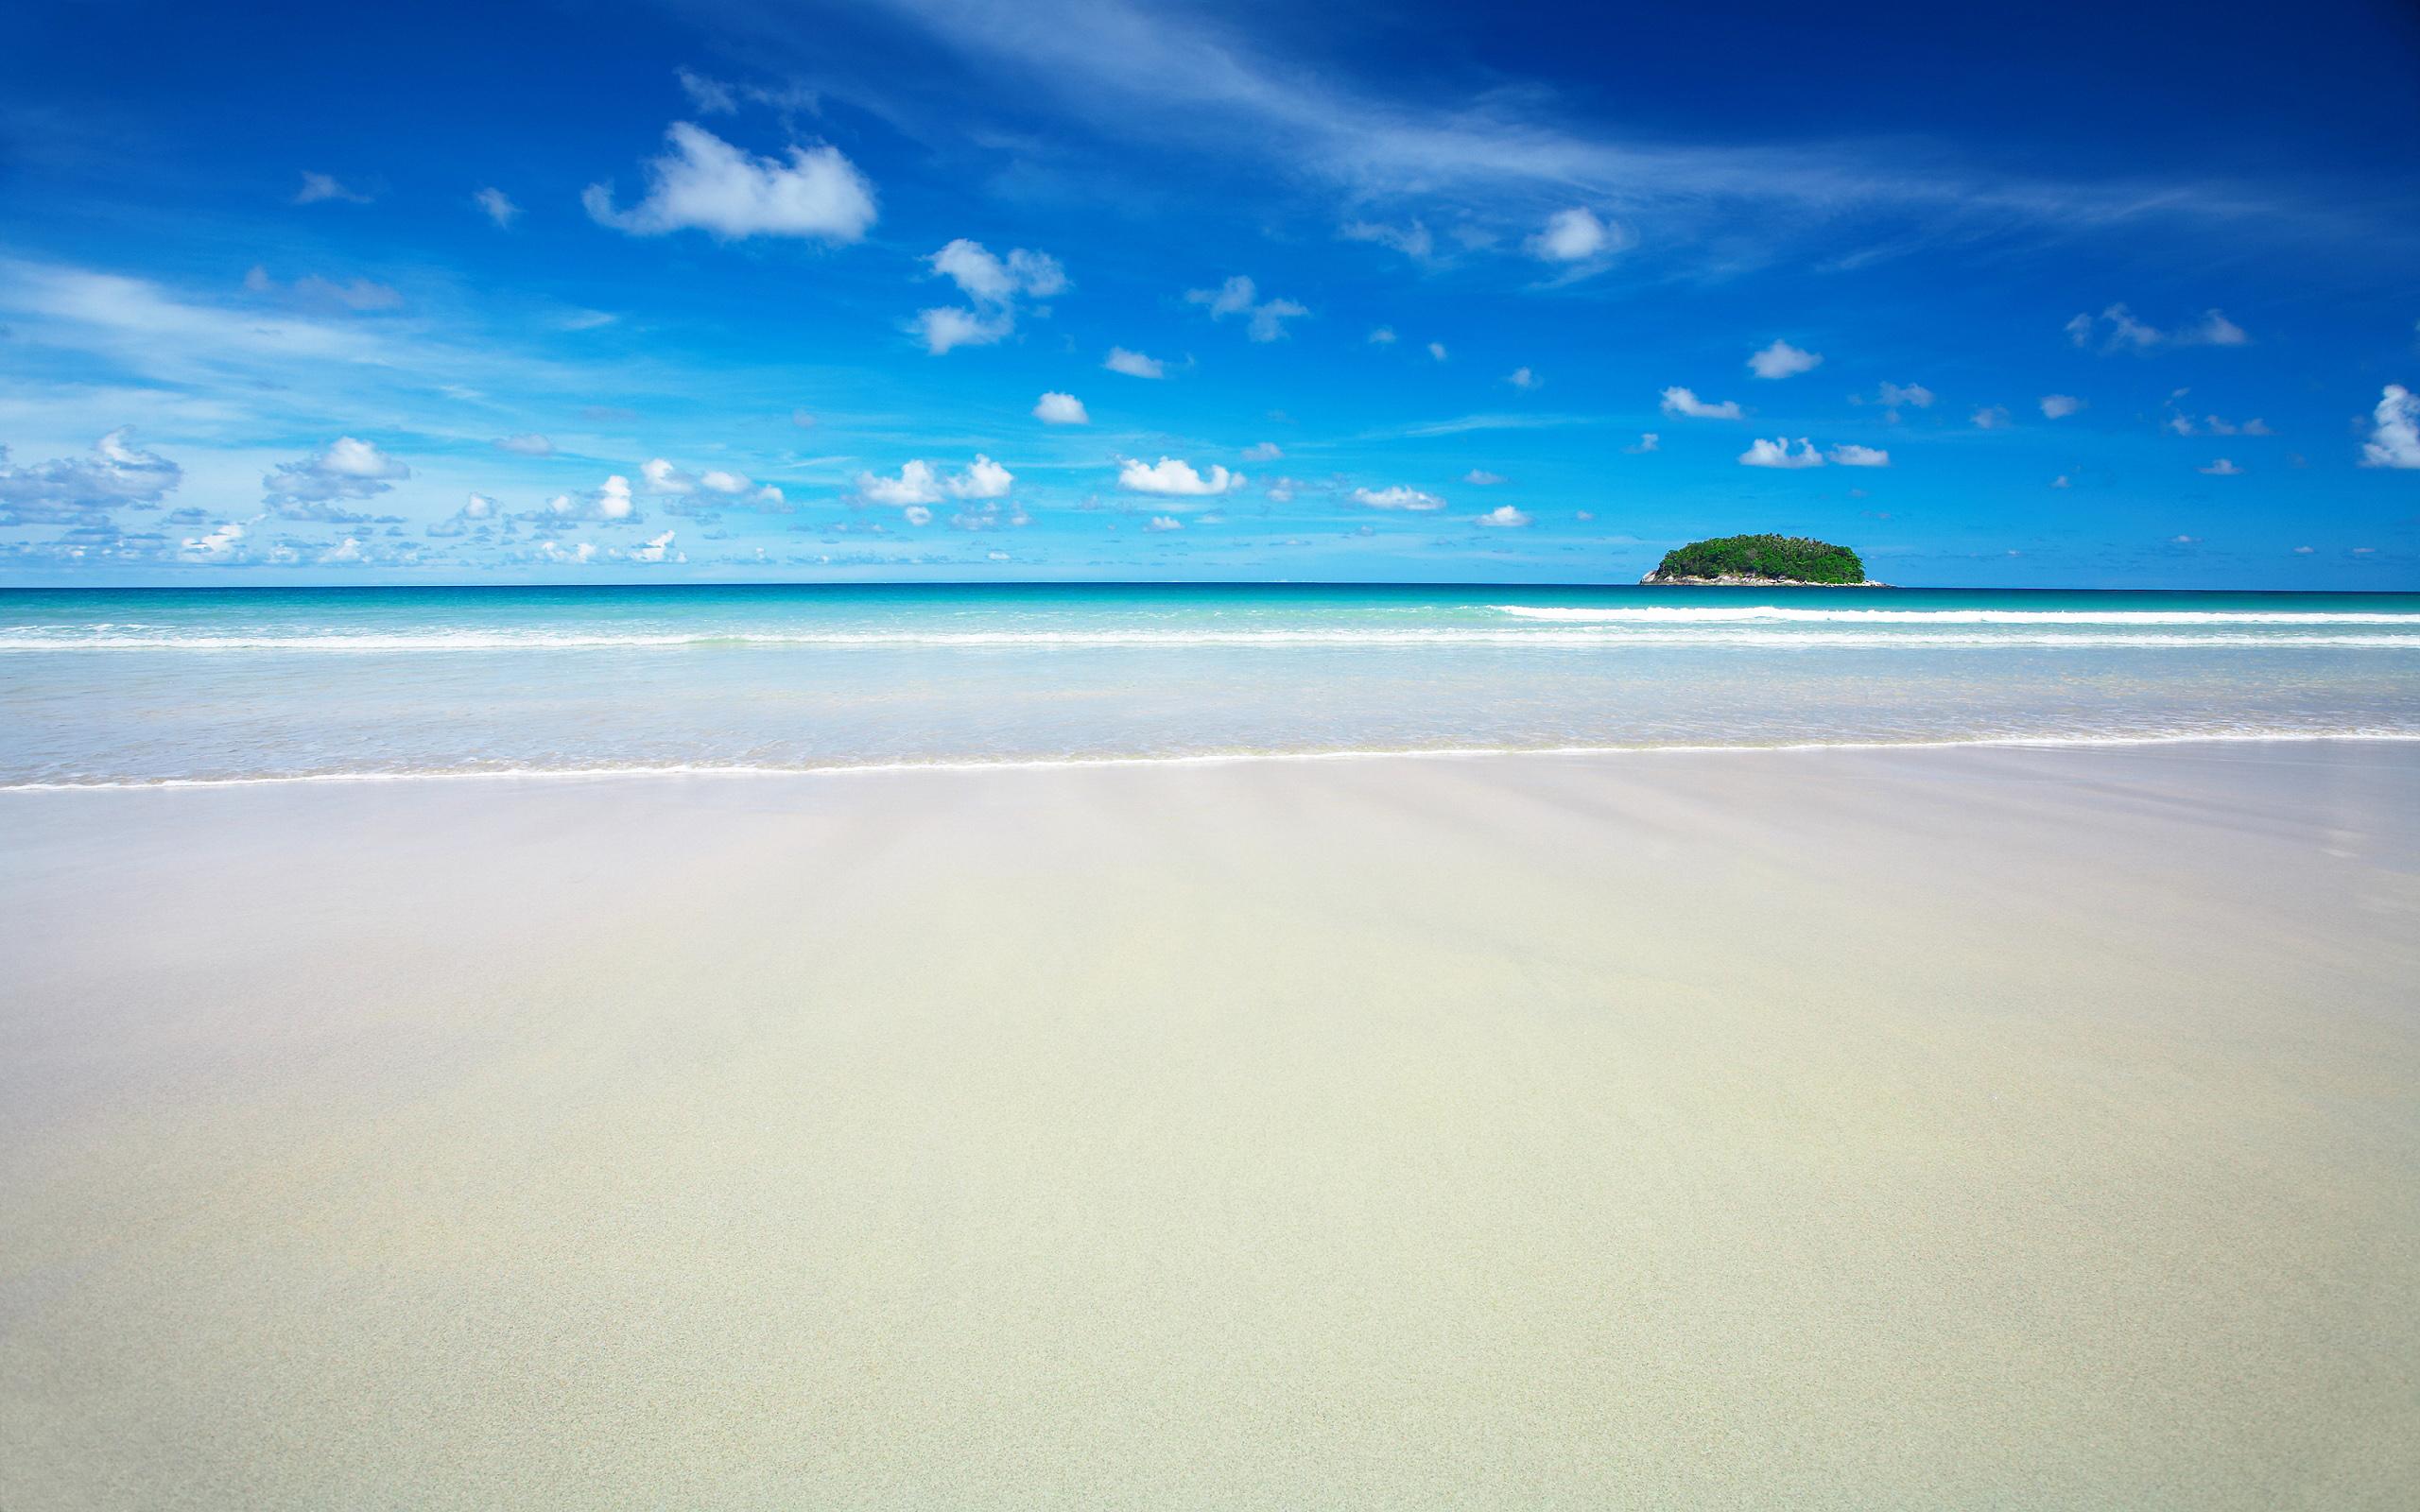 Playa, isla y mar azul - 2560x1600